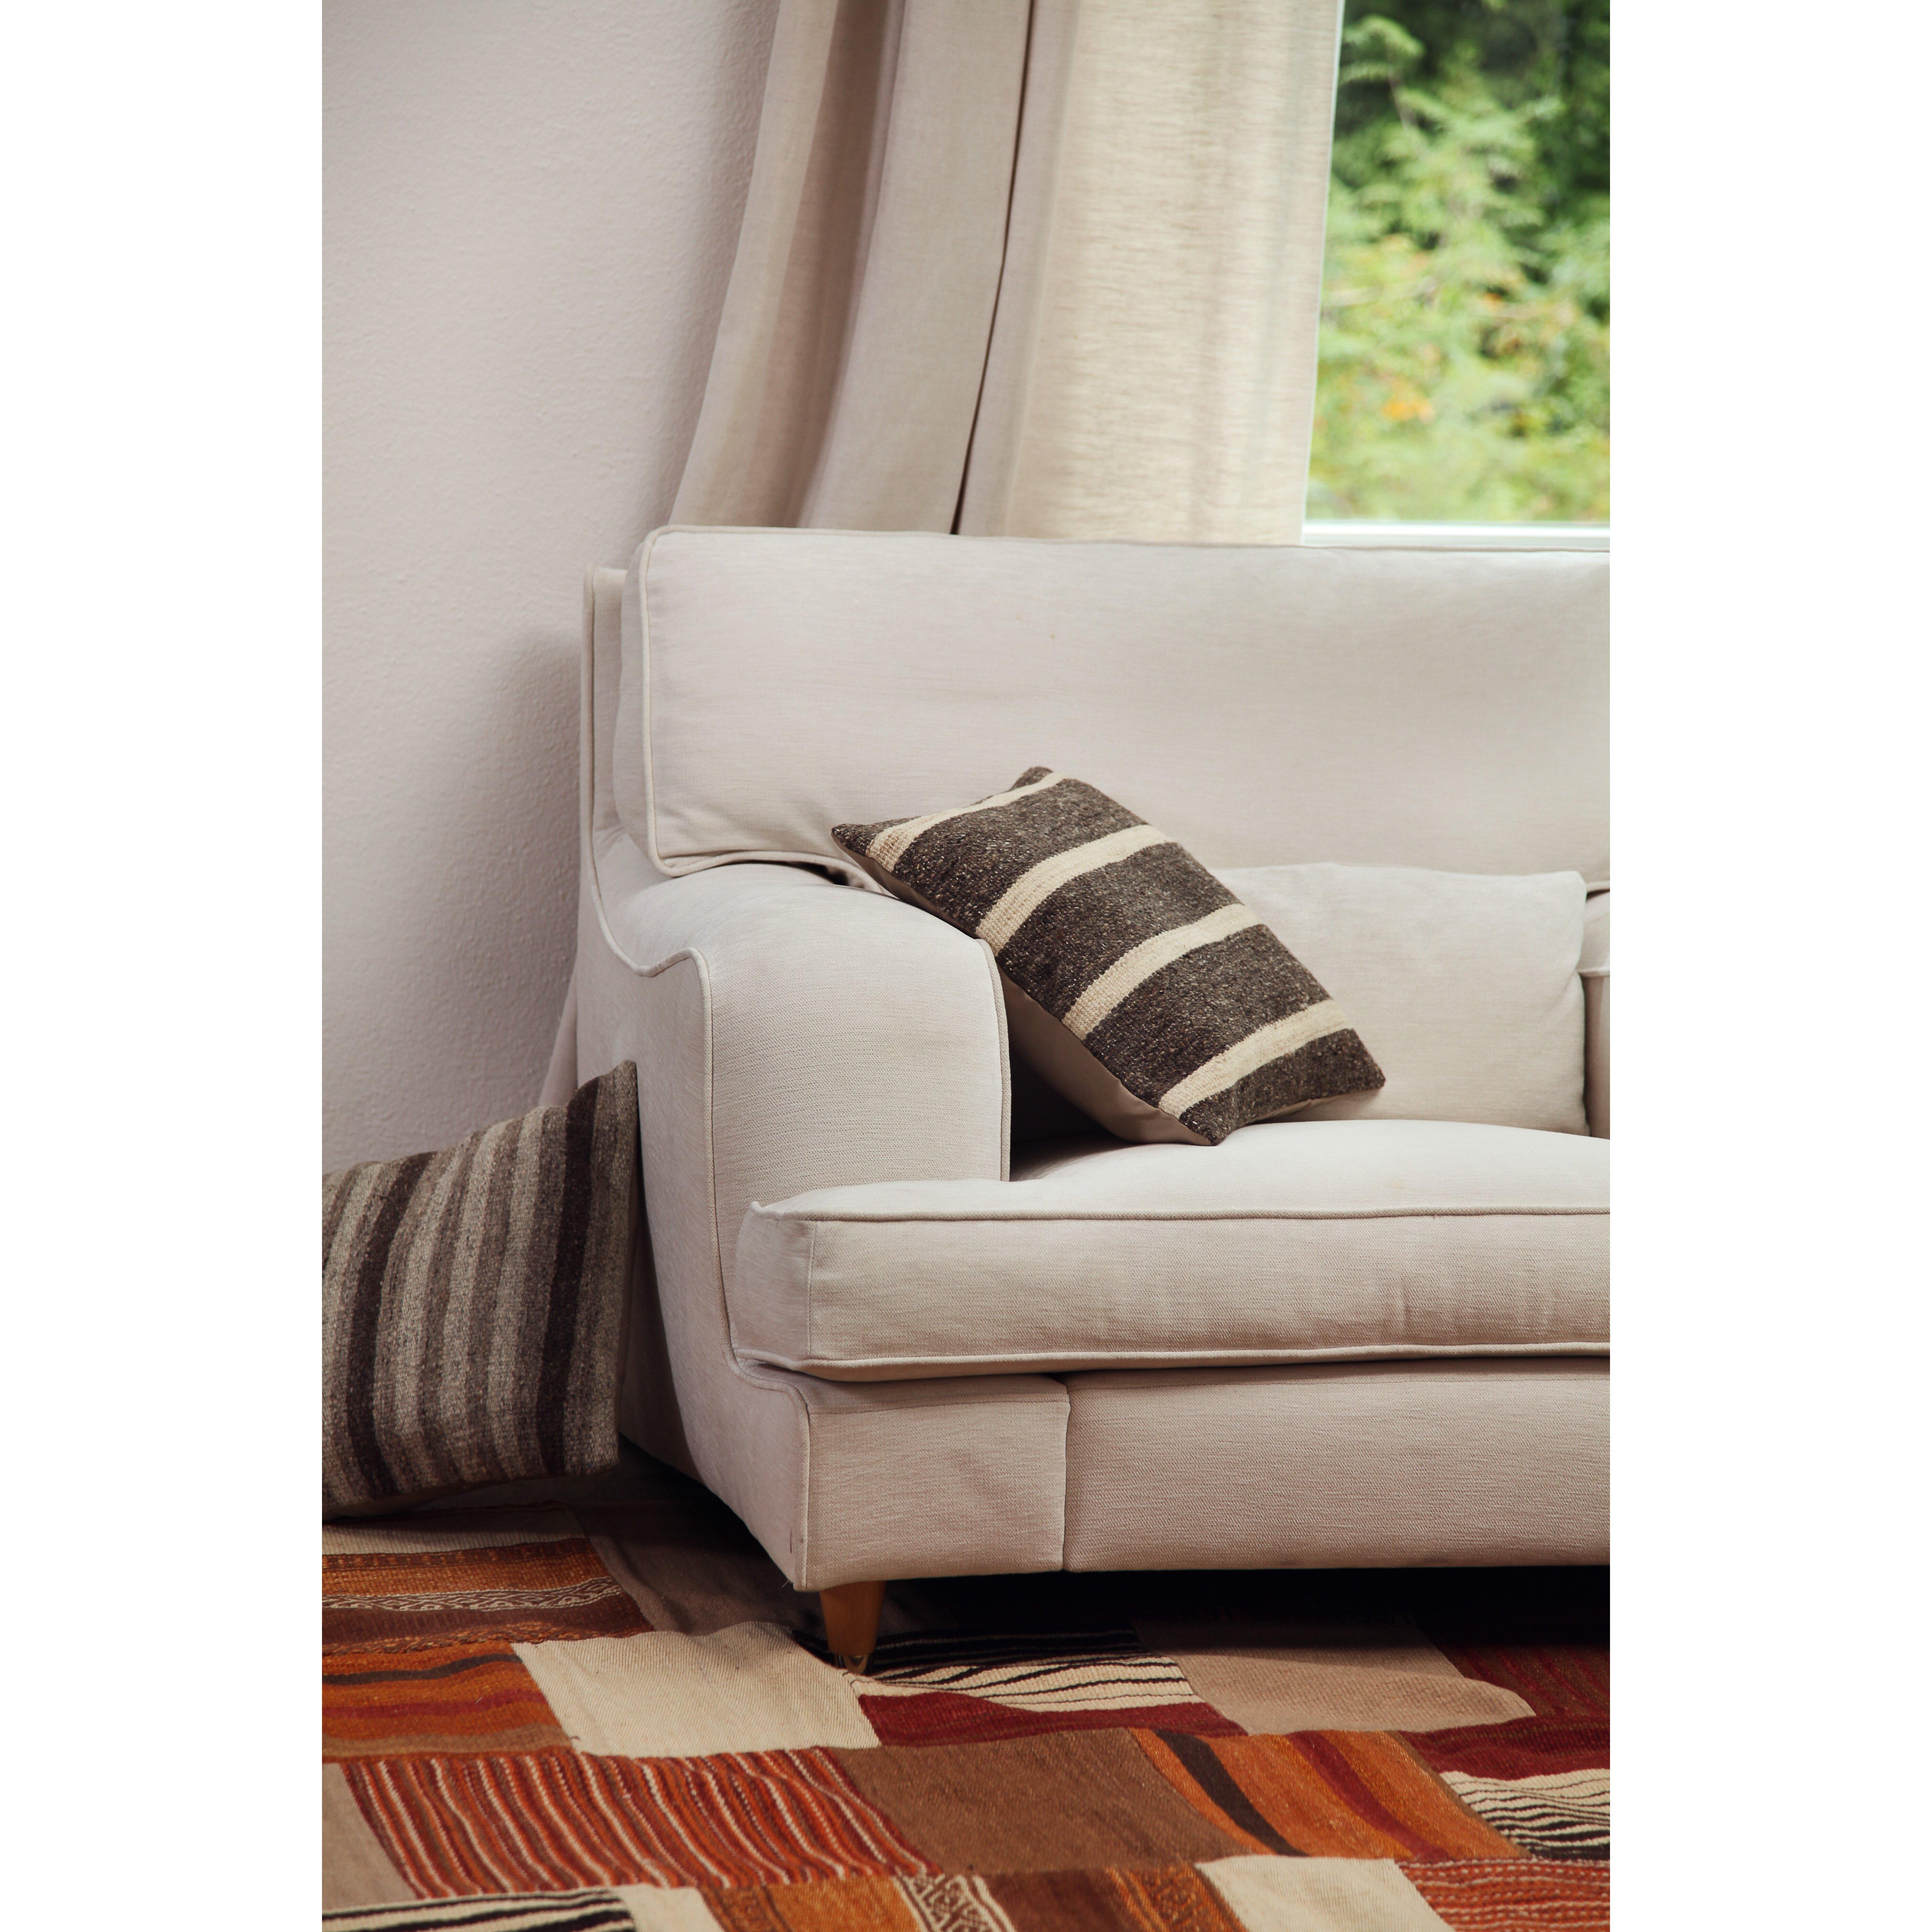 talis vertriebs gmbh handgewebter wohnteppich mash up in. Black Bedroom Furniture Sets. Home Design Ideas